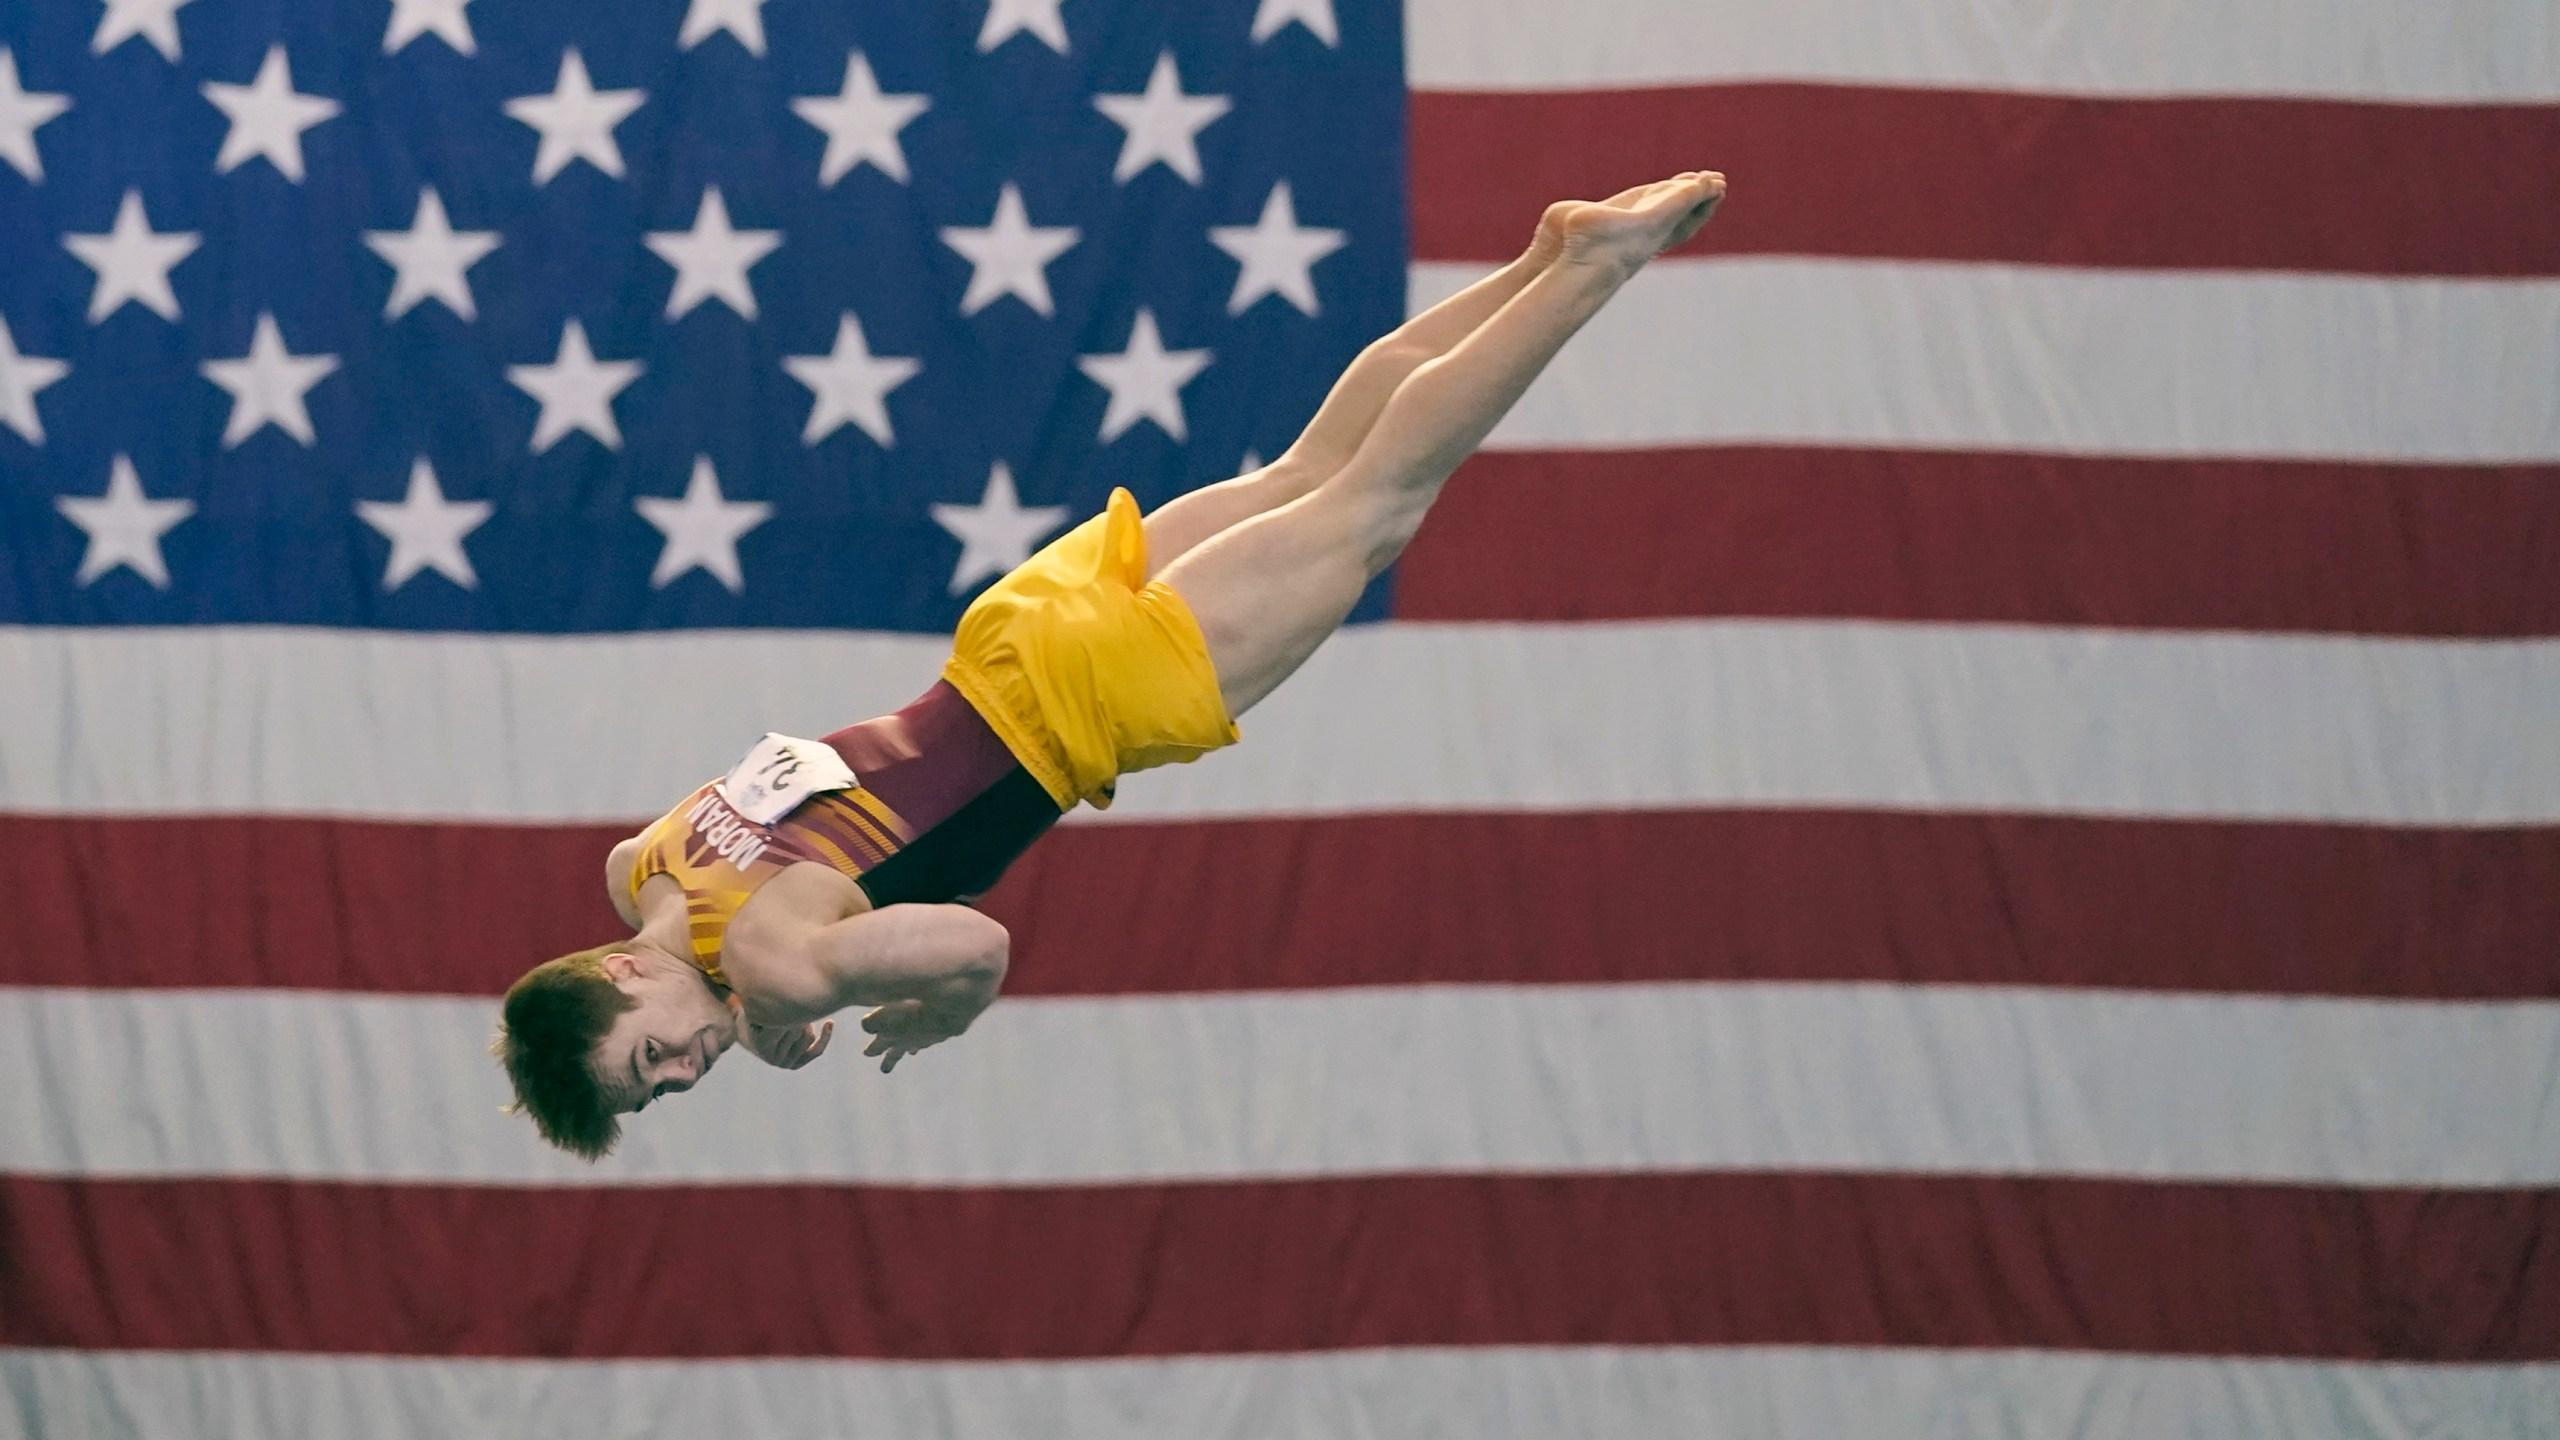 Image of men's gymnastics